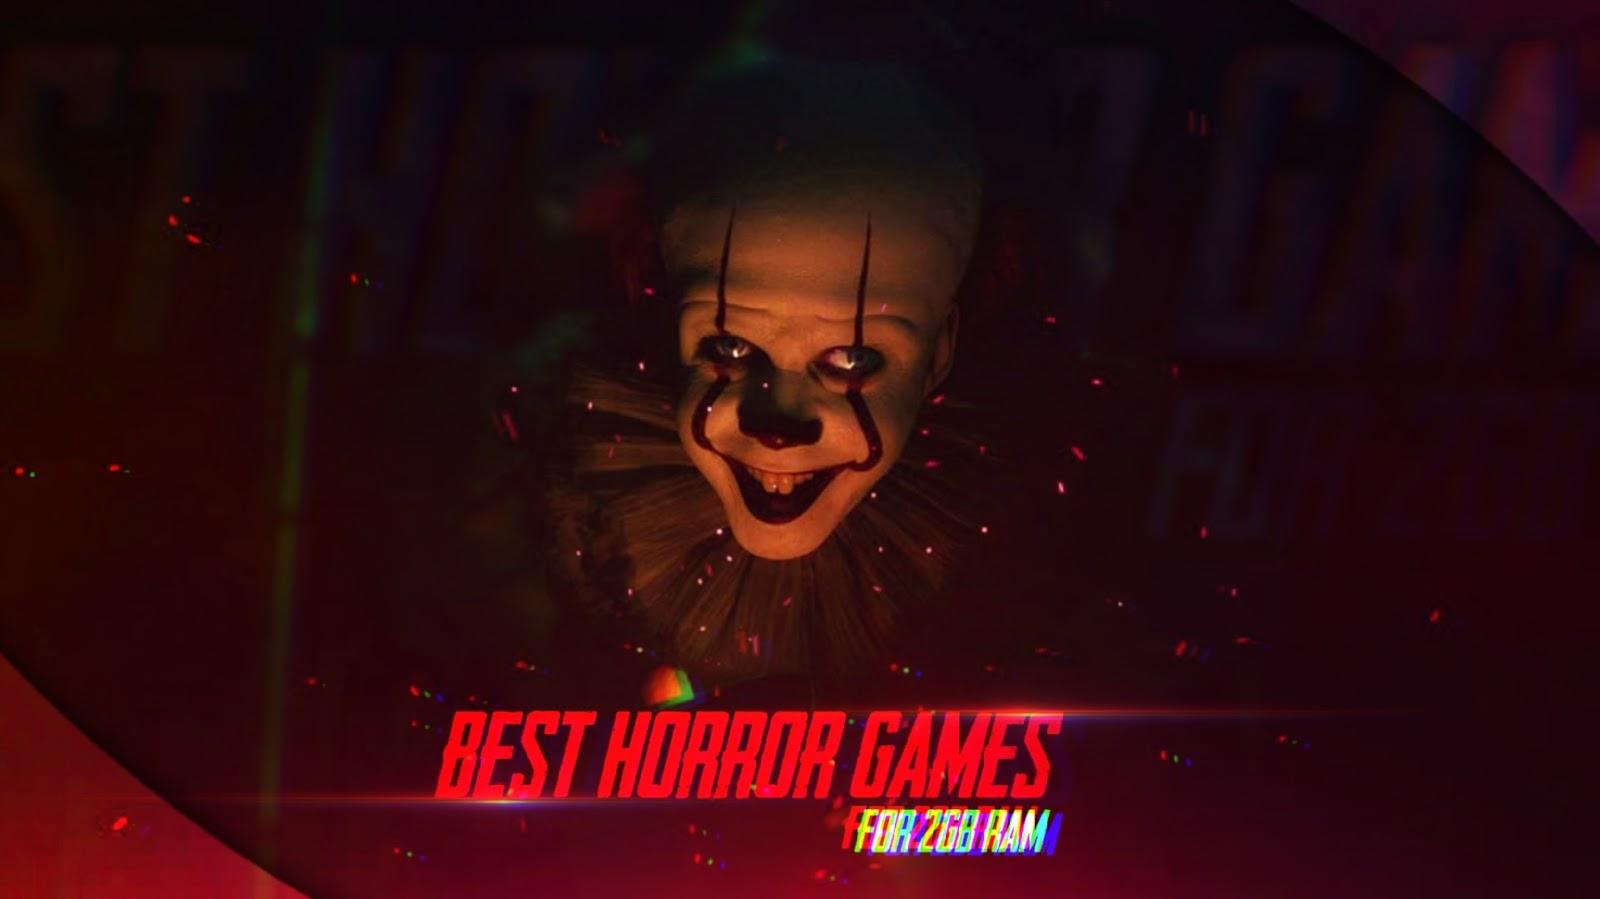 Best Horror Games 2 GB RAM